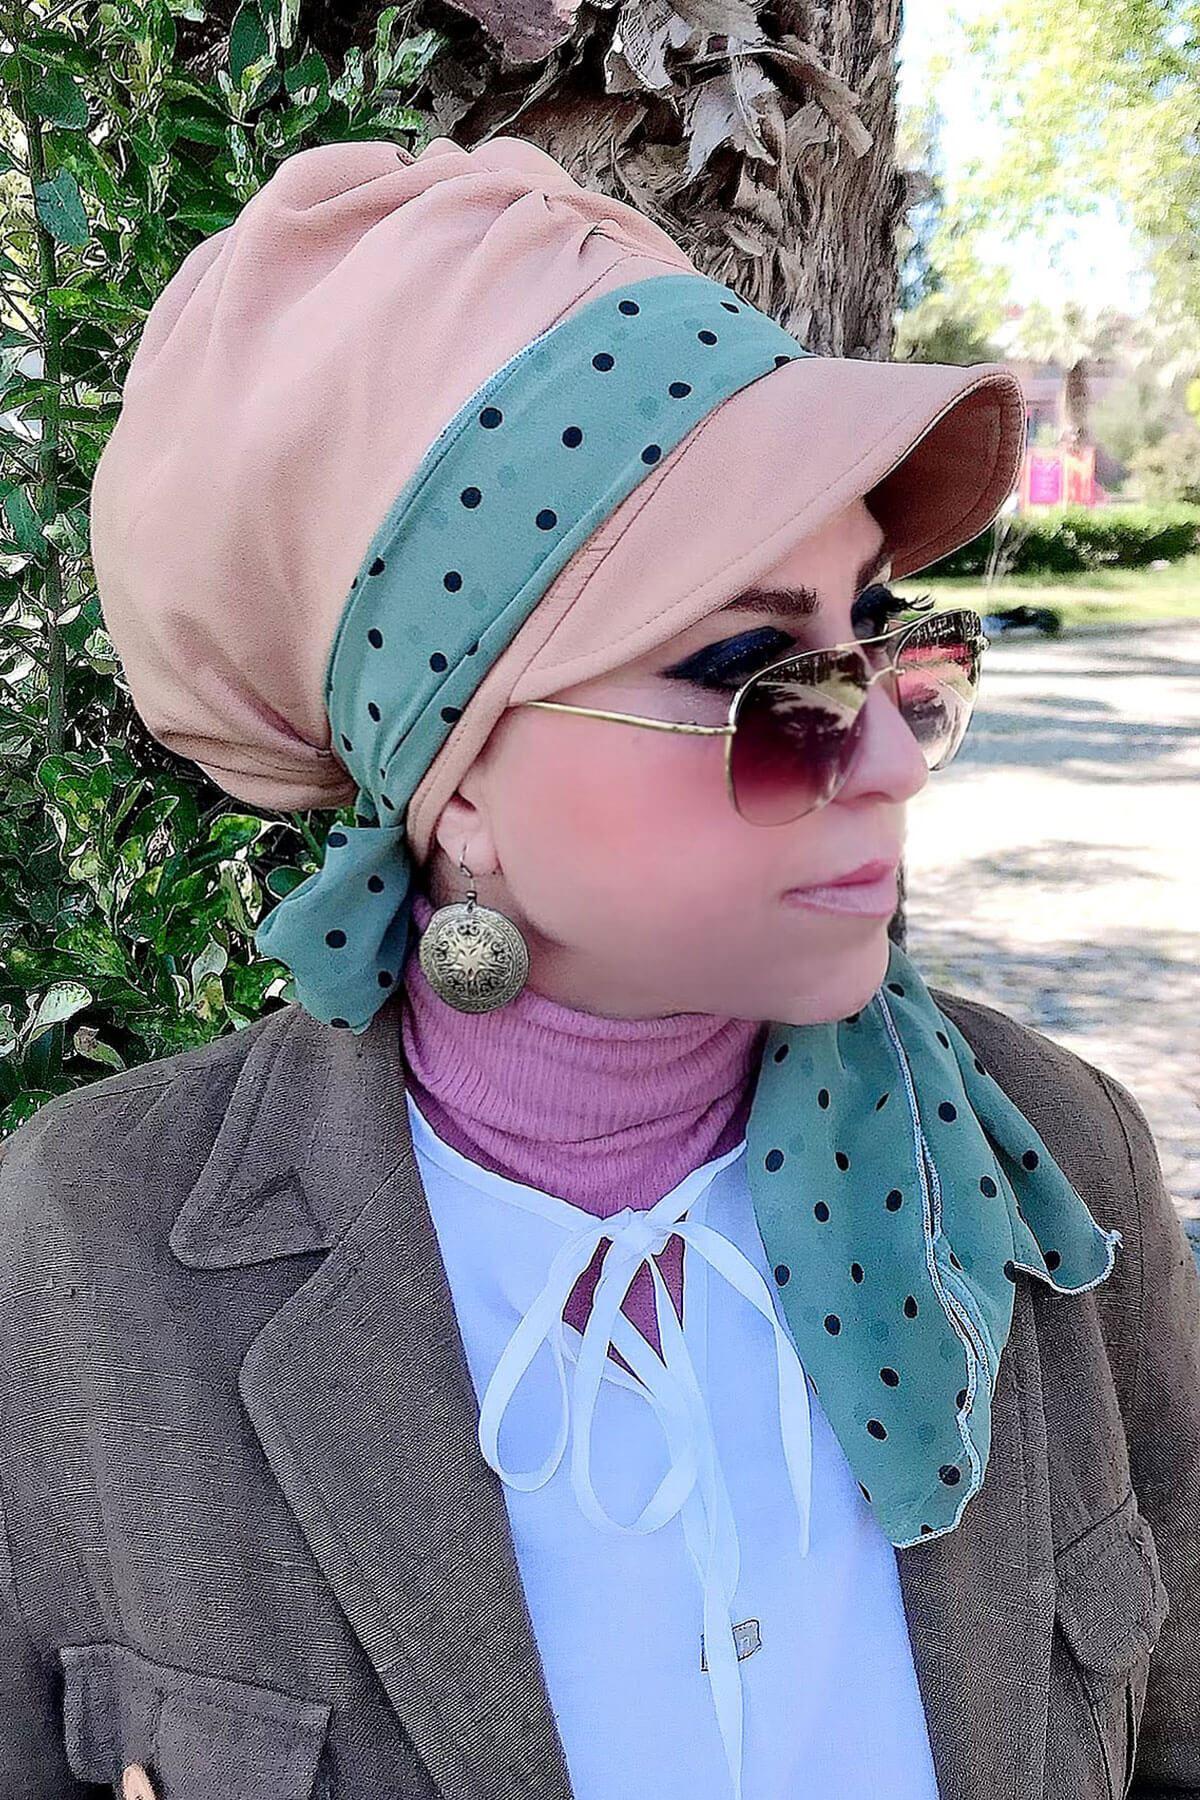 Su Yeşili Puantiyeli Vizon Fularlı Şapka